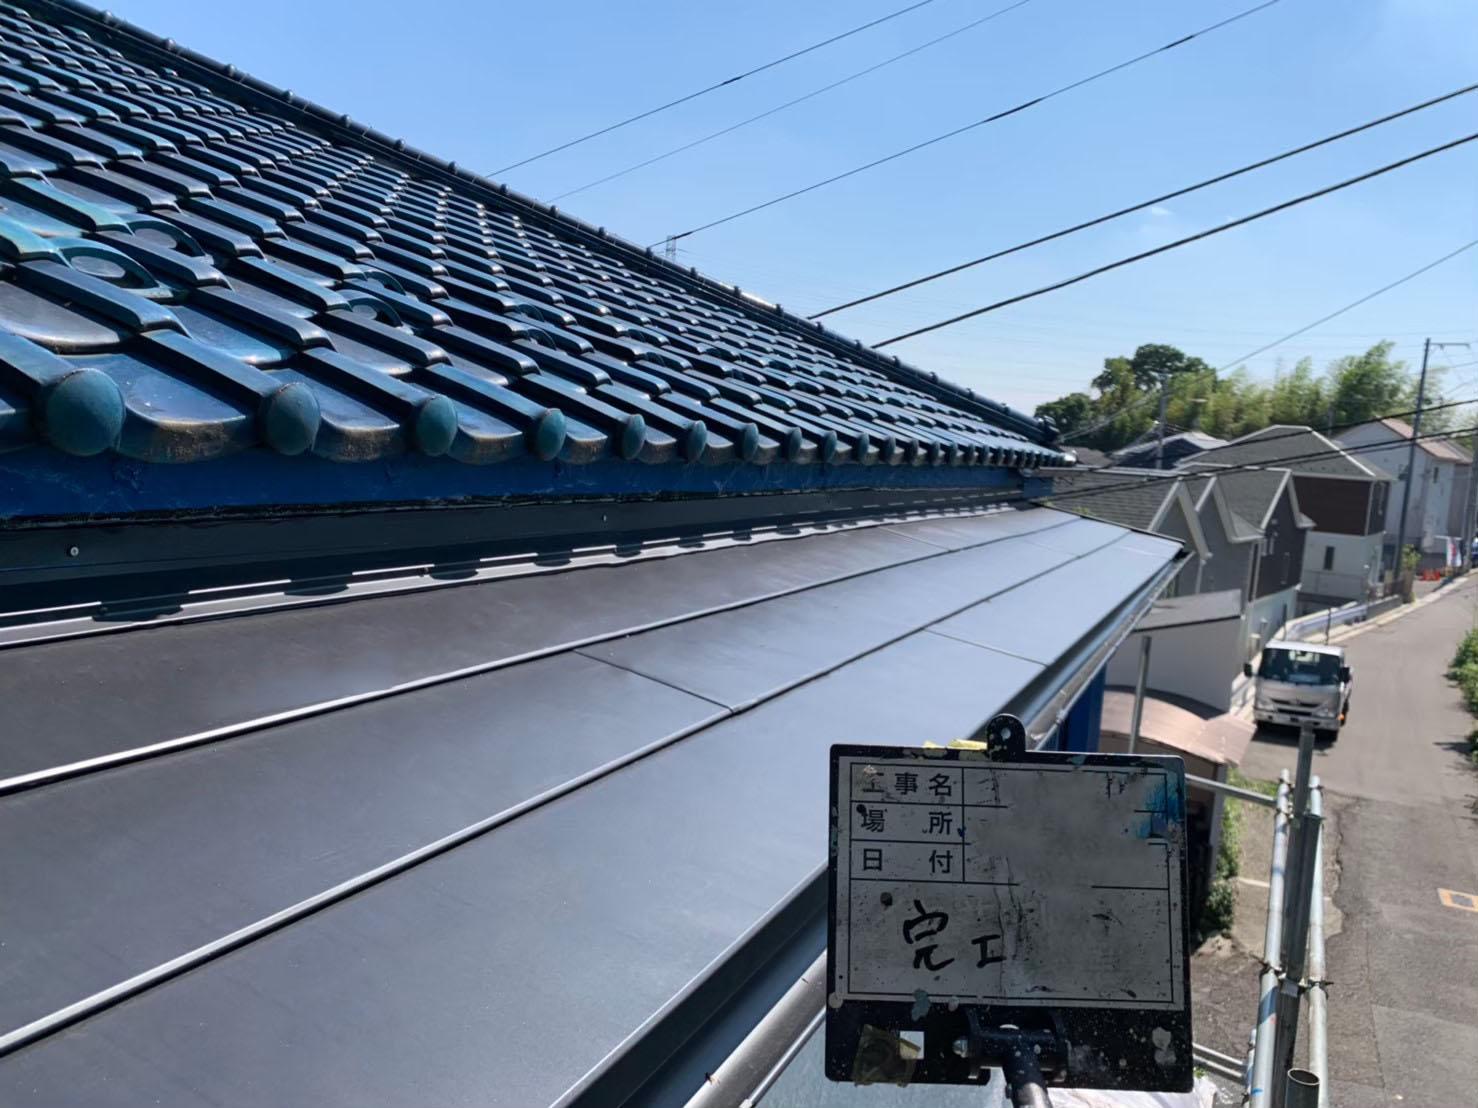 稲城市で火災保険活用の屋根葺き替え雨樋工事及び屋根外壁塗装